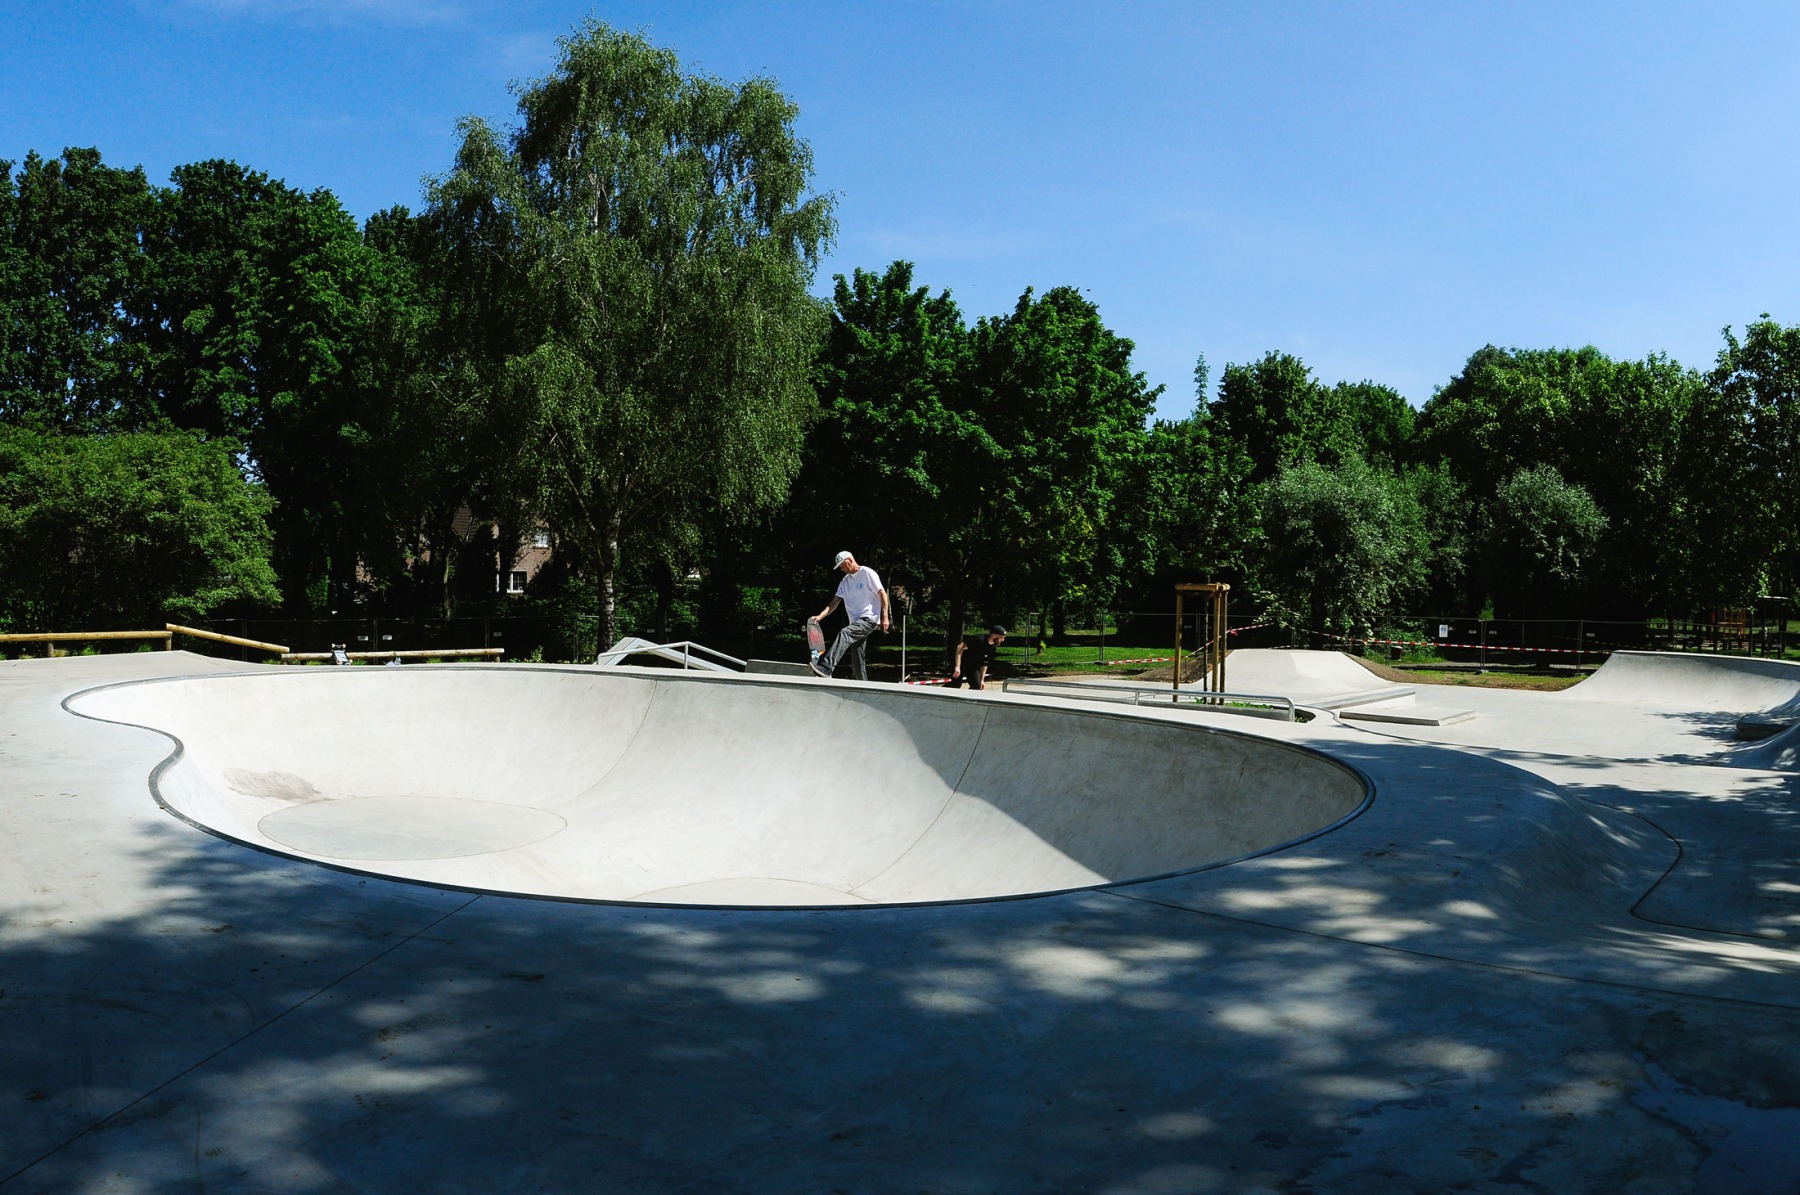 Skatepark_Sonsbeck_05.20_03